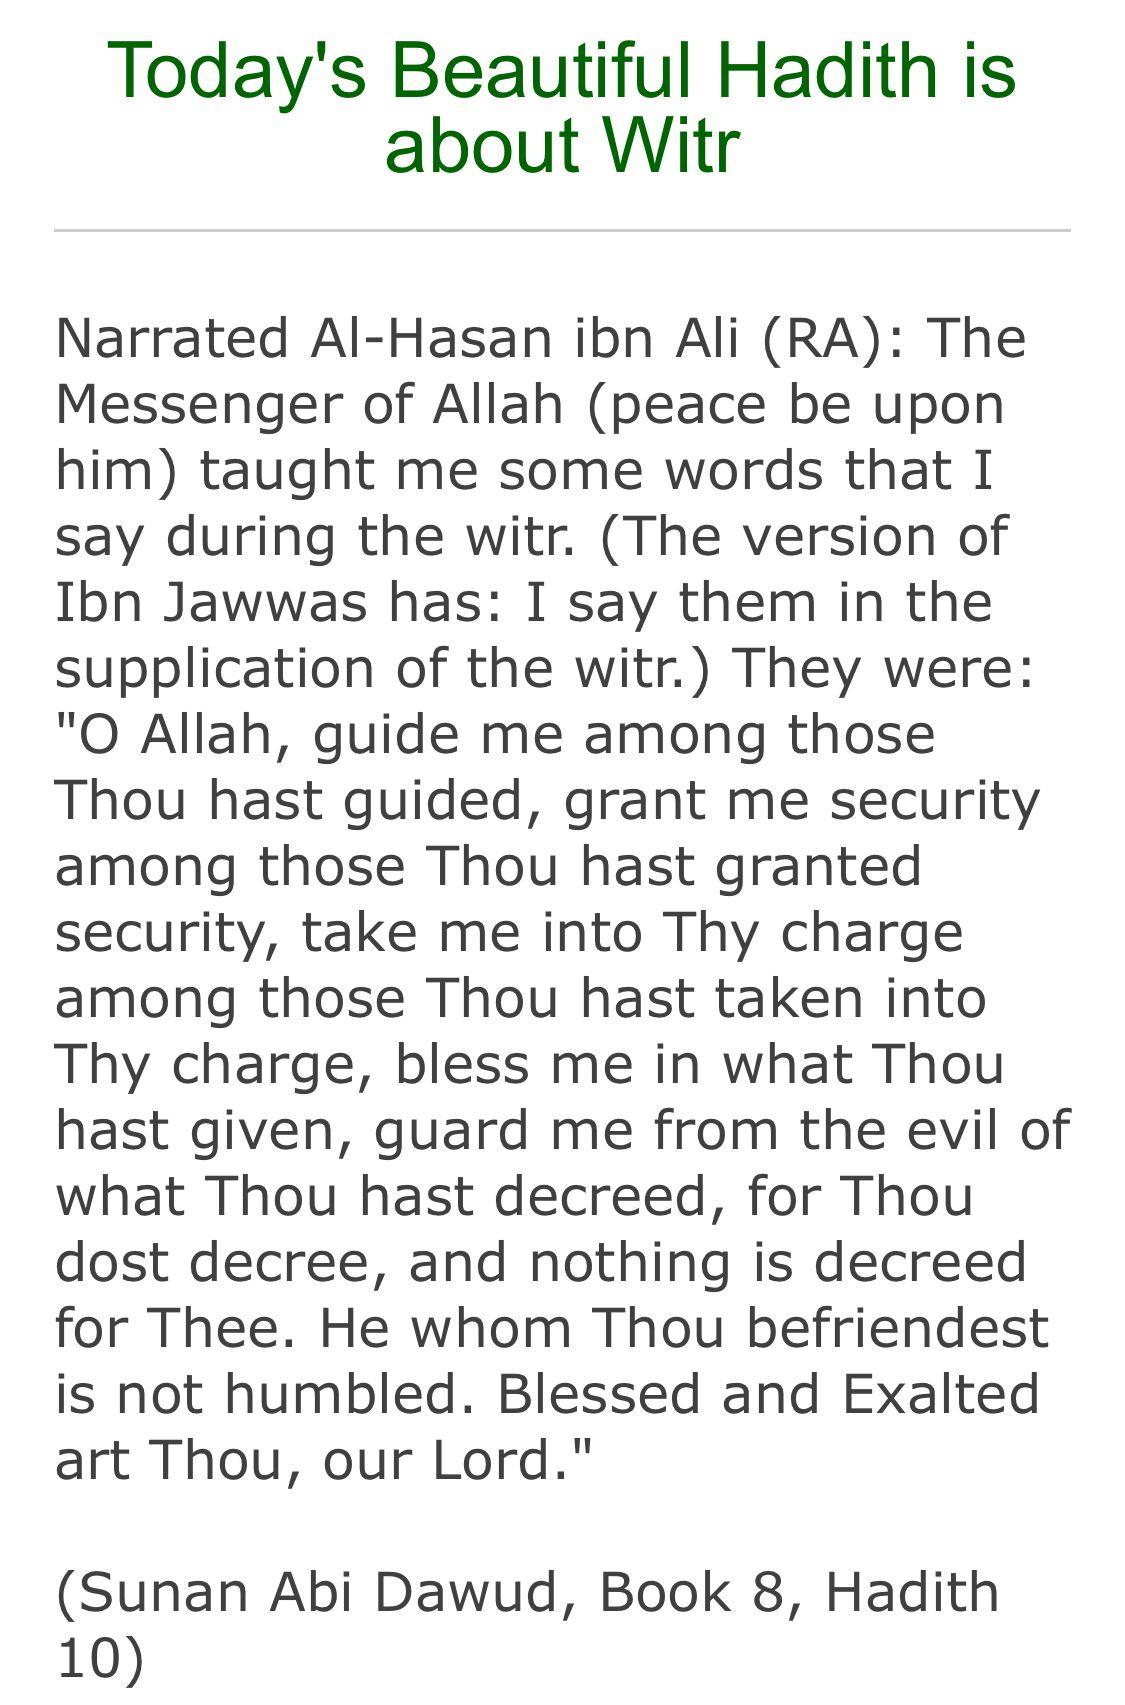 Pin by Waqar Sajid on Islam | Islam, Quran, Words